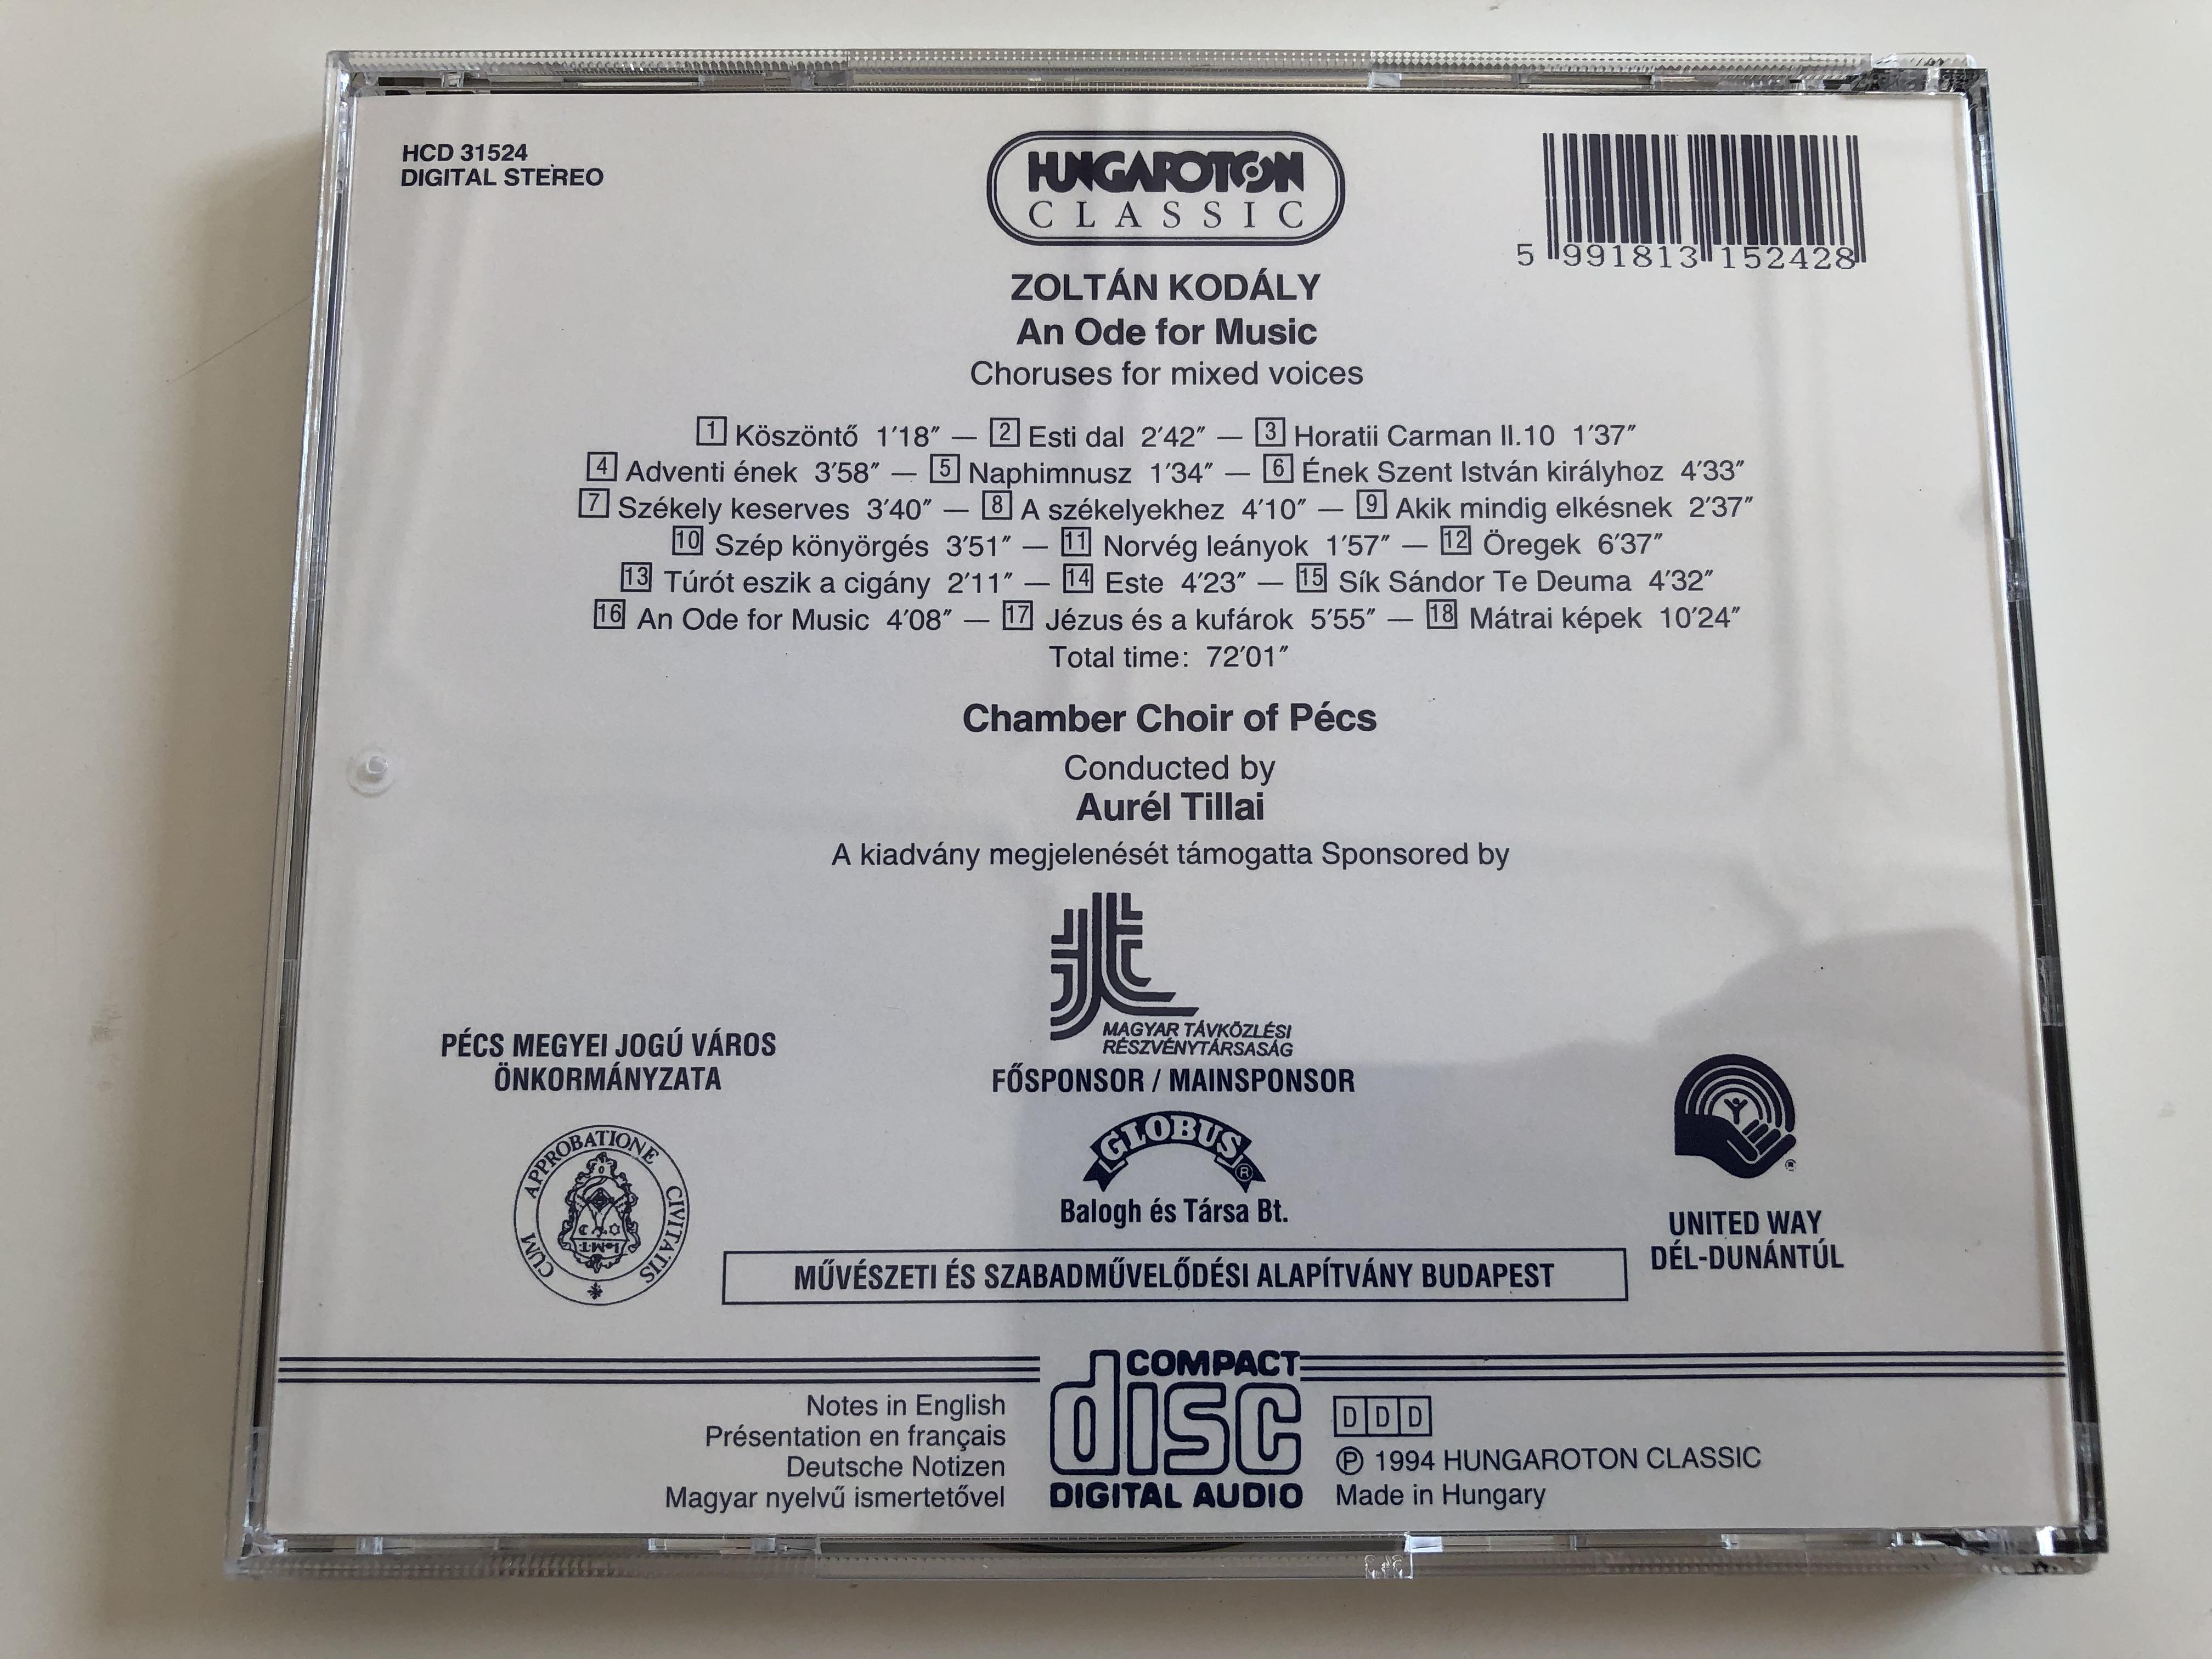 zolt-n-kod-ly-an-ode-for-music-choruses-for-mixed-voices-chamber-choir-of-p-cs-aur-l-tillai-hungaroton-classic-audio-cd-1994-hcd-31524-7-.jpg